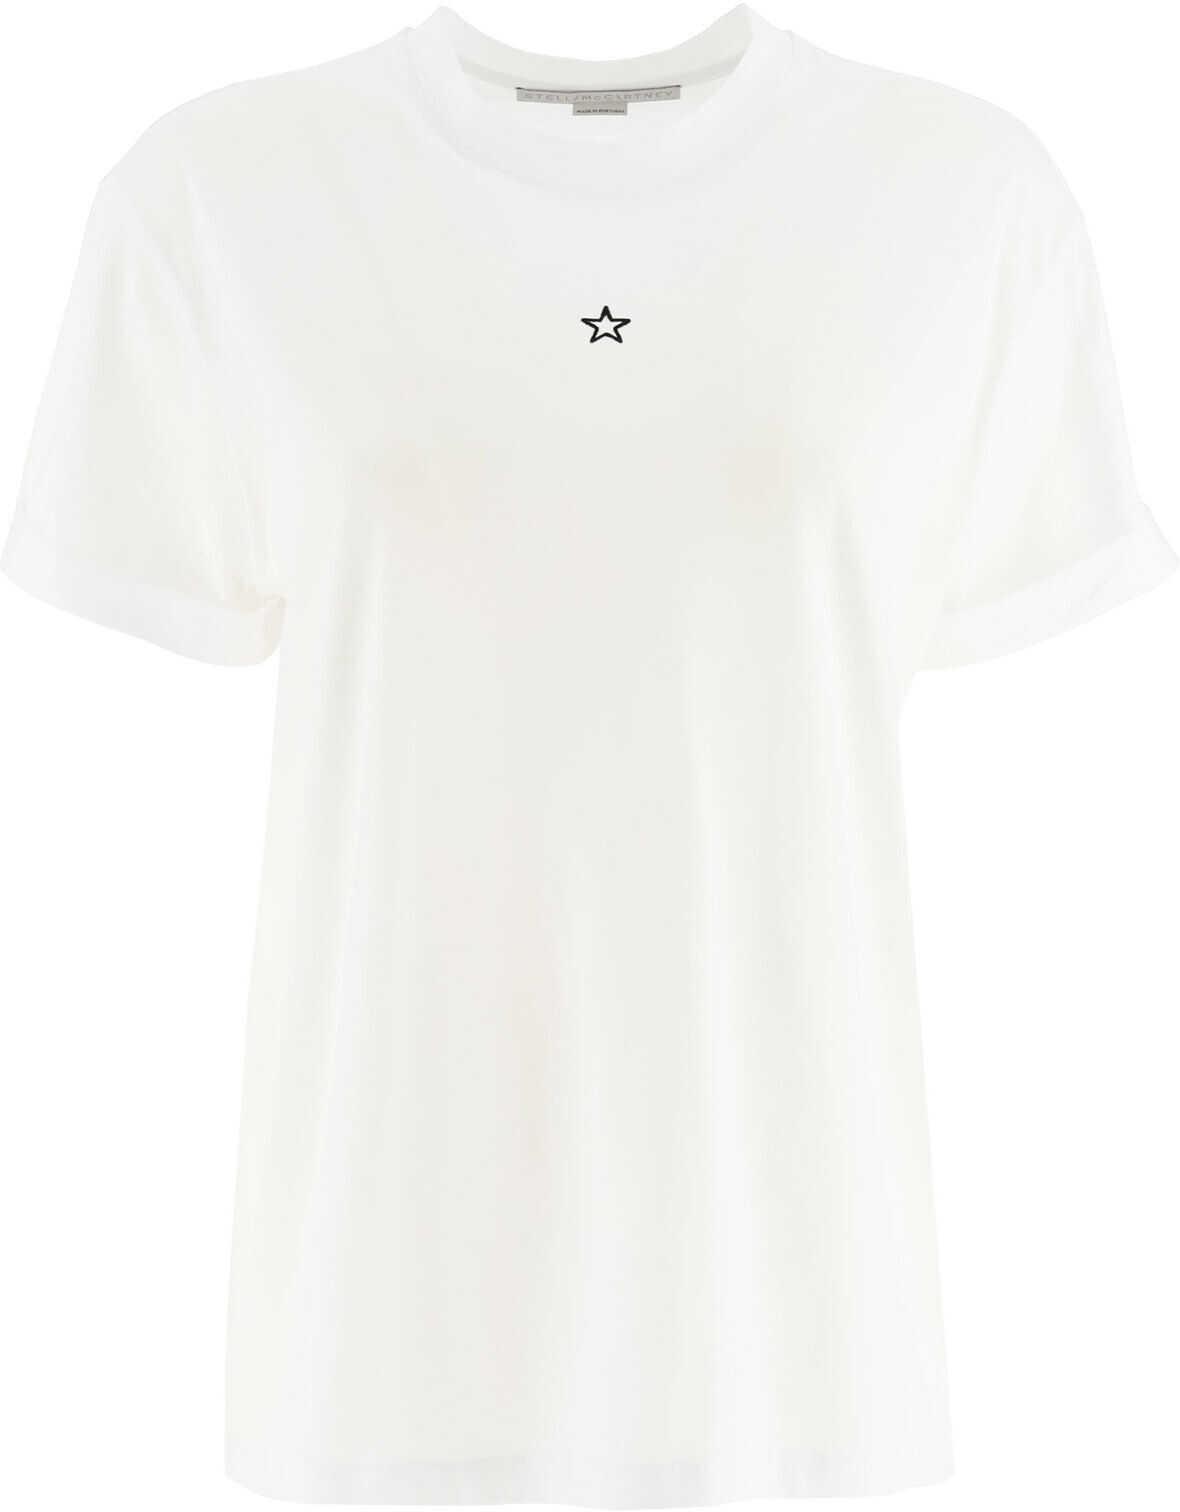 adidas by Stella McCartney 457142 SIW20 PURE WHITE